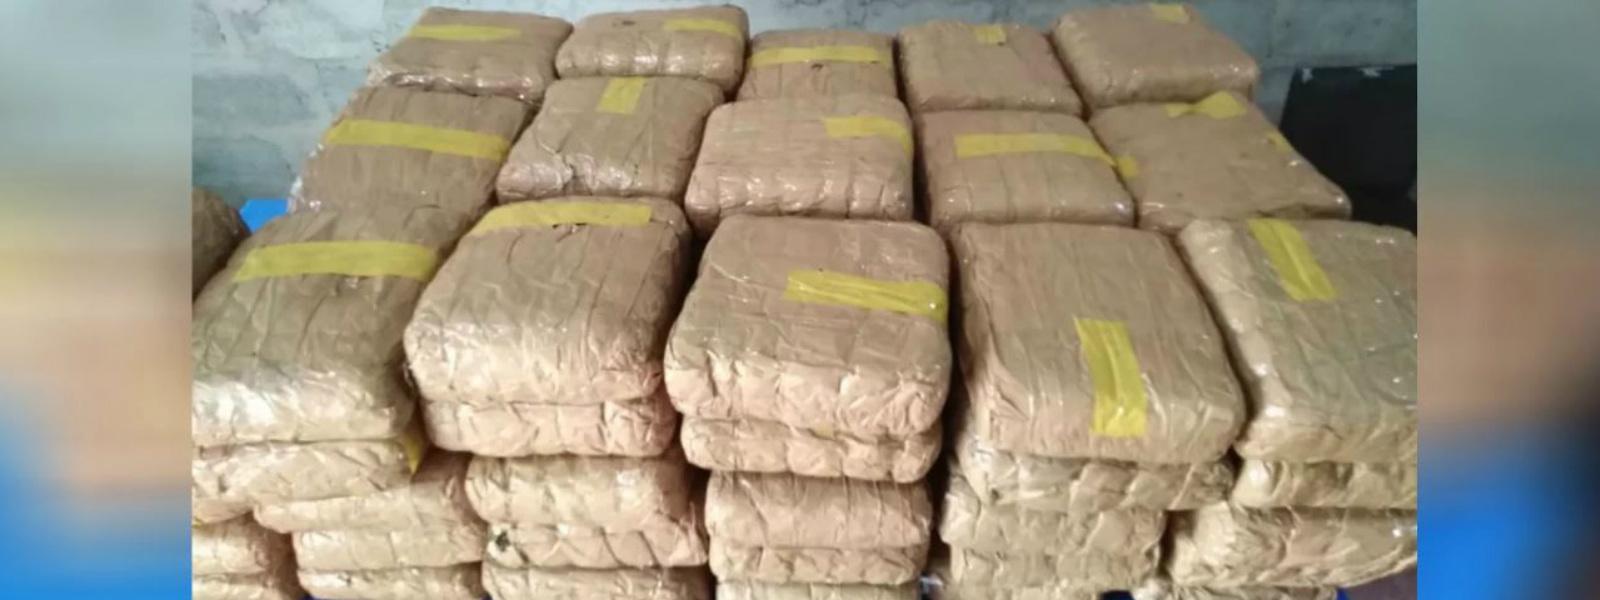 170kg of Kerala Ganja busted in Puttalam